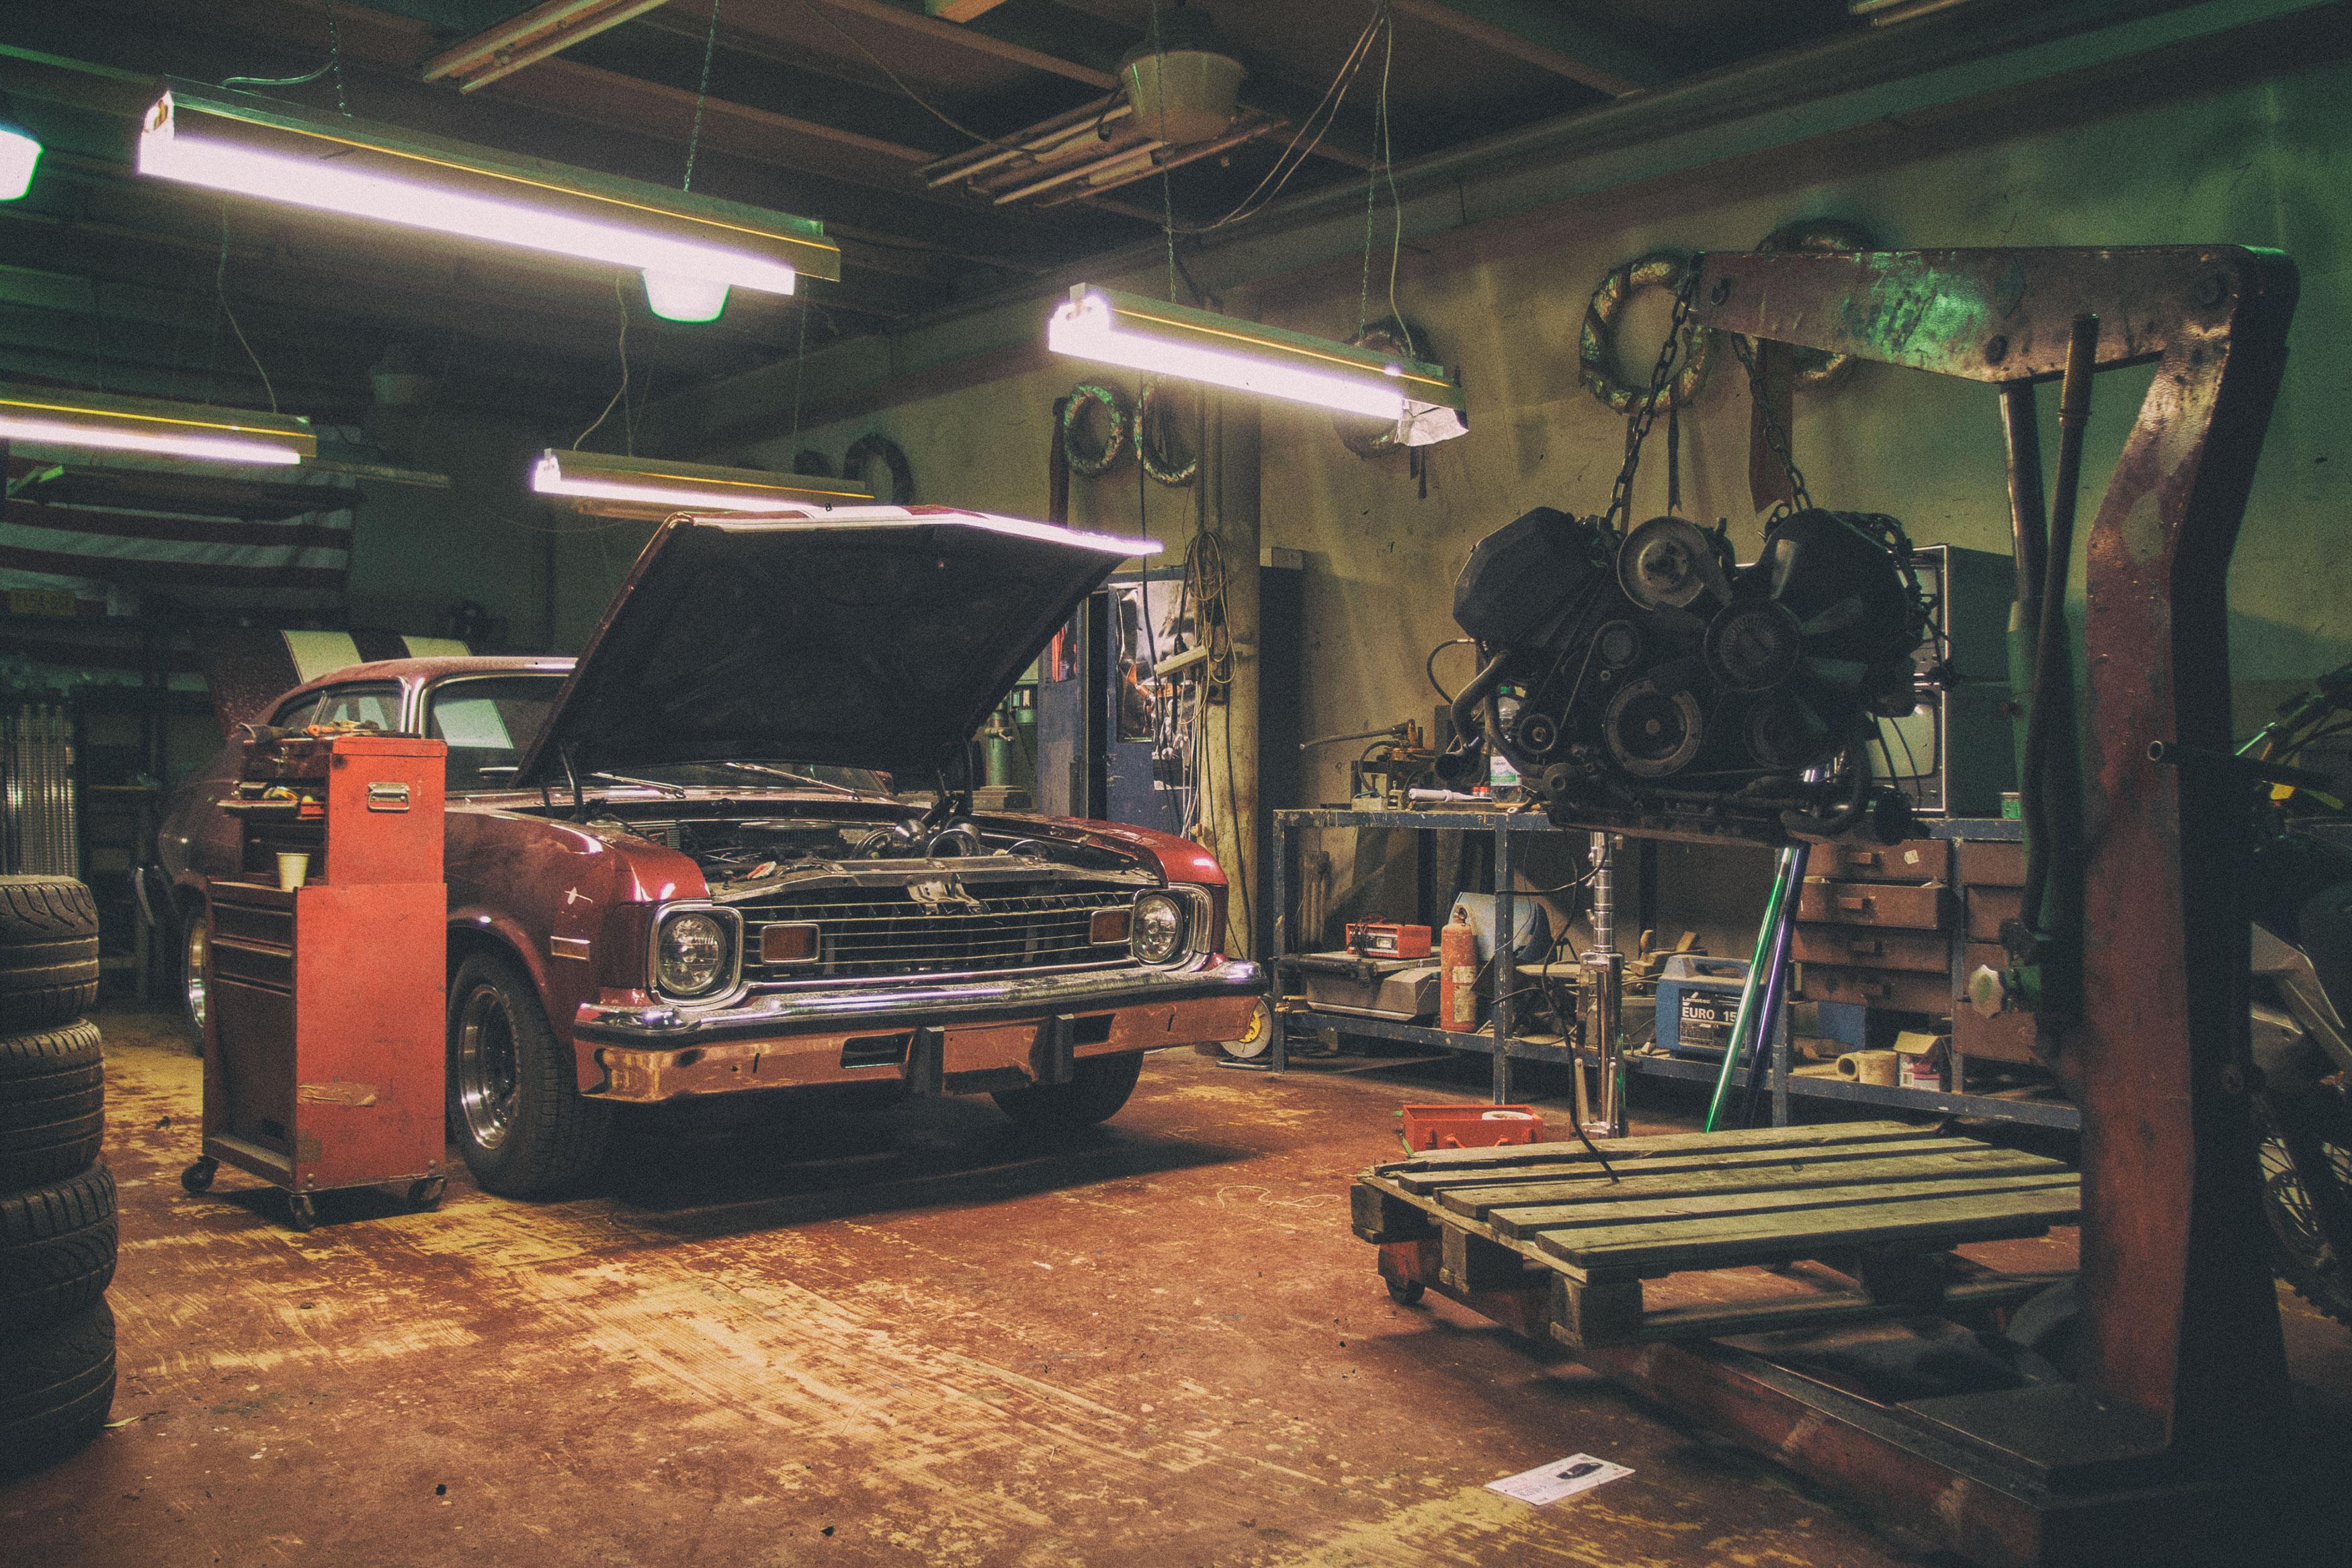 Mechanic Shops Near Me >> Mechanic Shops Near Me Top New Car Release Date